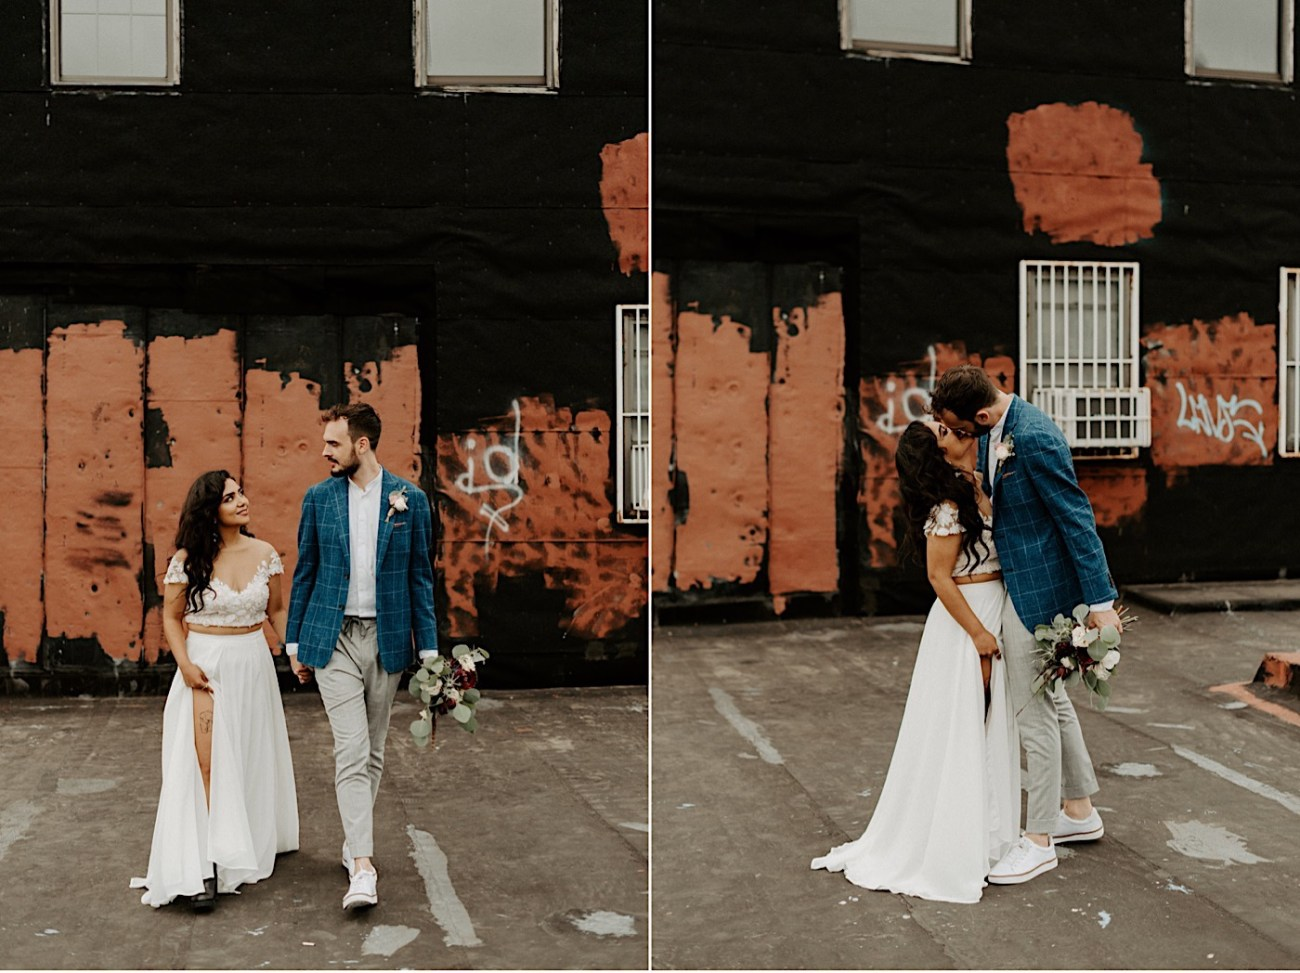 LIC Wedding Greenpoint Wedding LIC Elopement New York Wedding Photographer 087